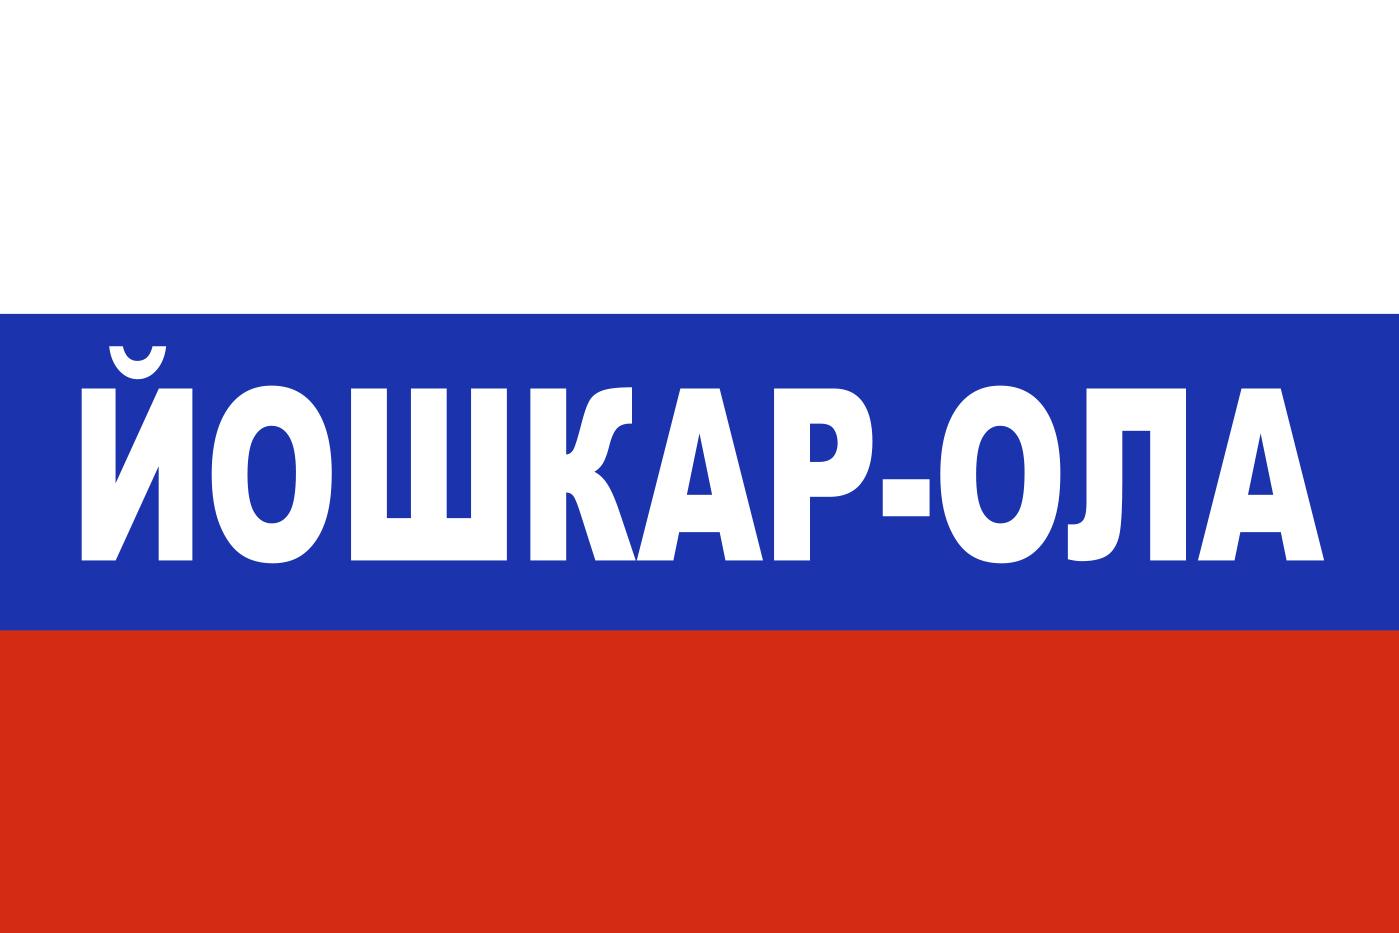 Флаг триколор Йошкар-Ола